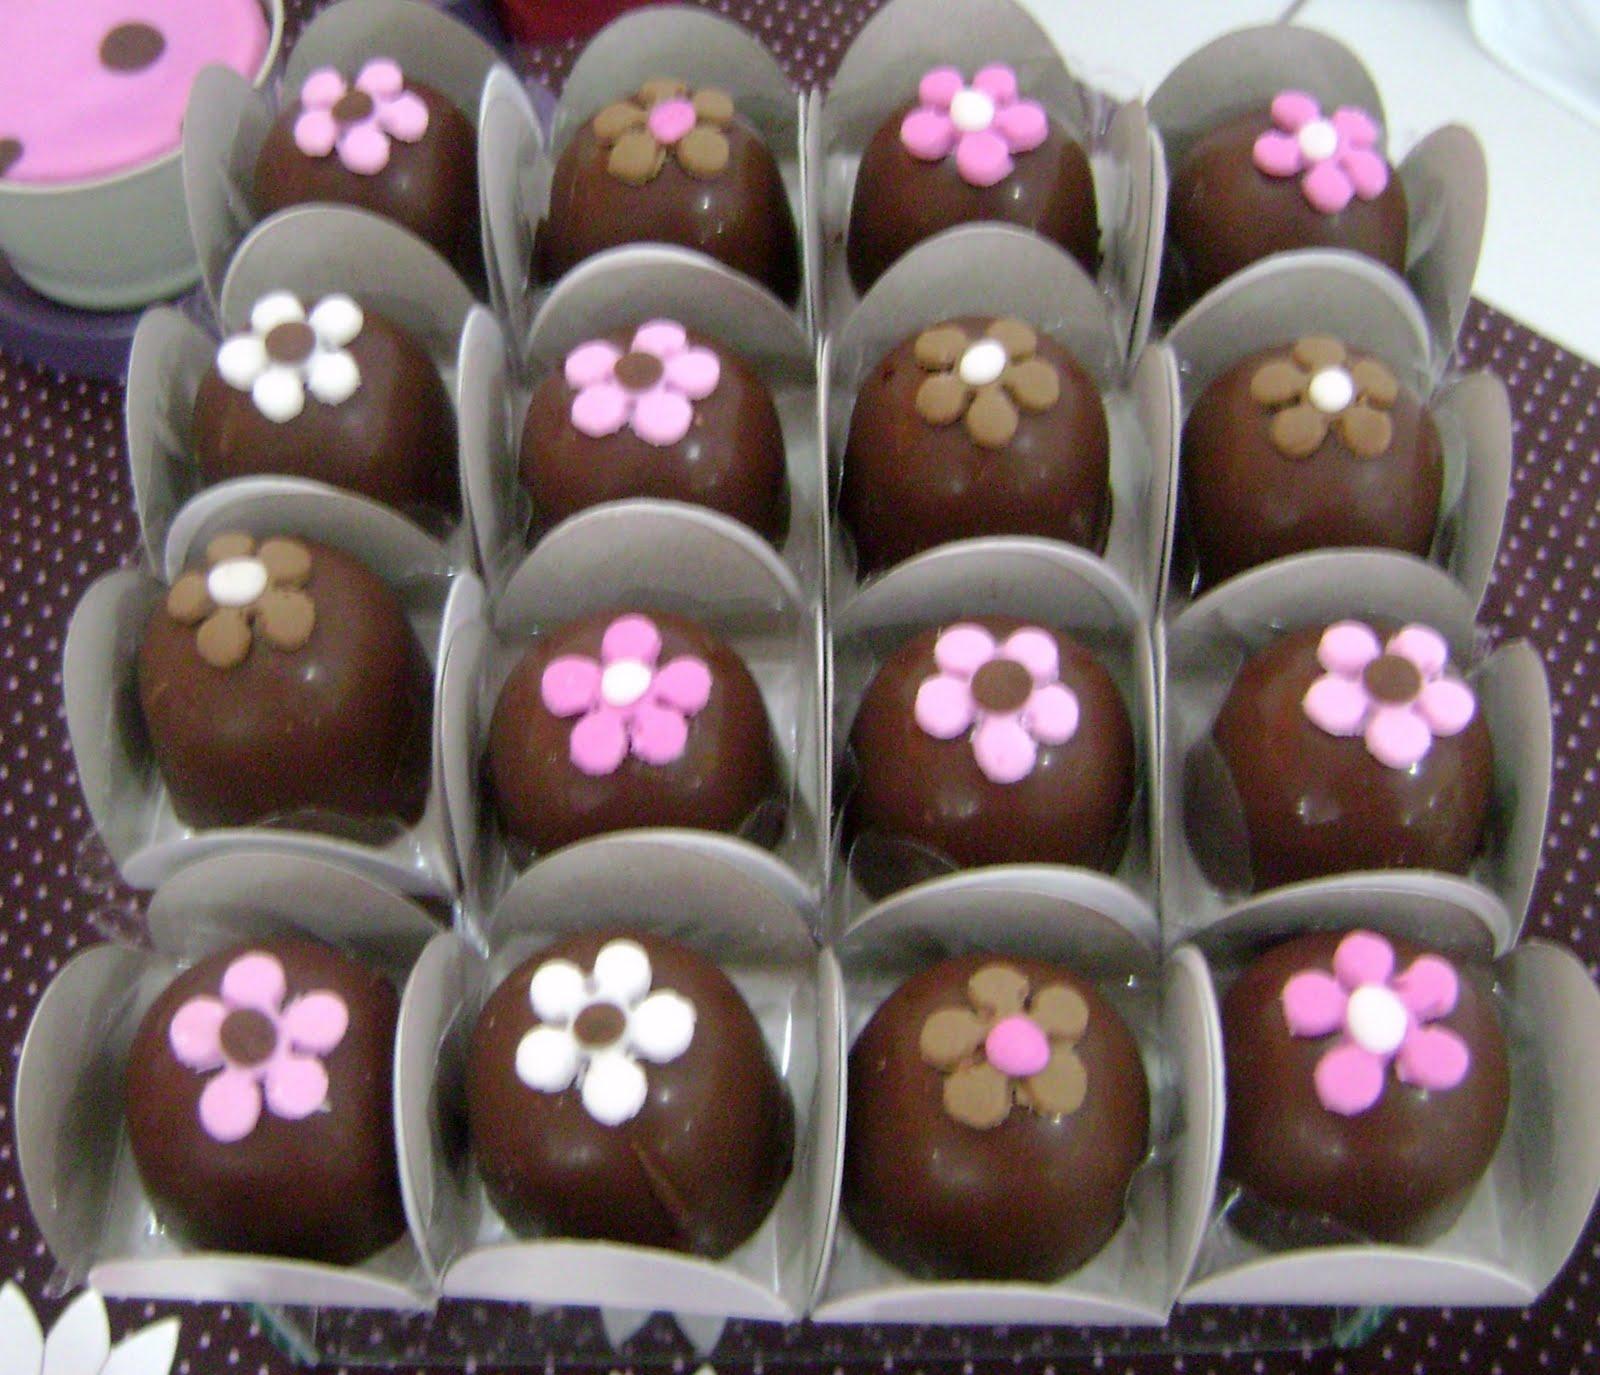 Michelle Lecce Bolos Doces e Chocolates: Chá de Panela #9F2C87 1600 1375